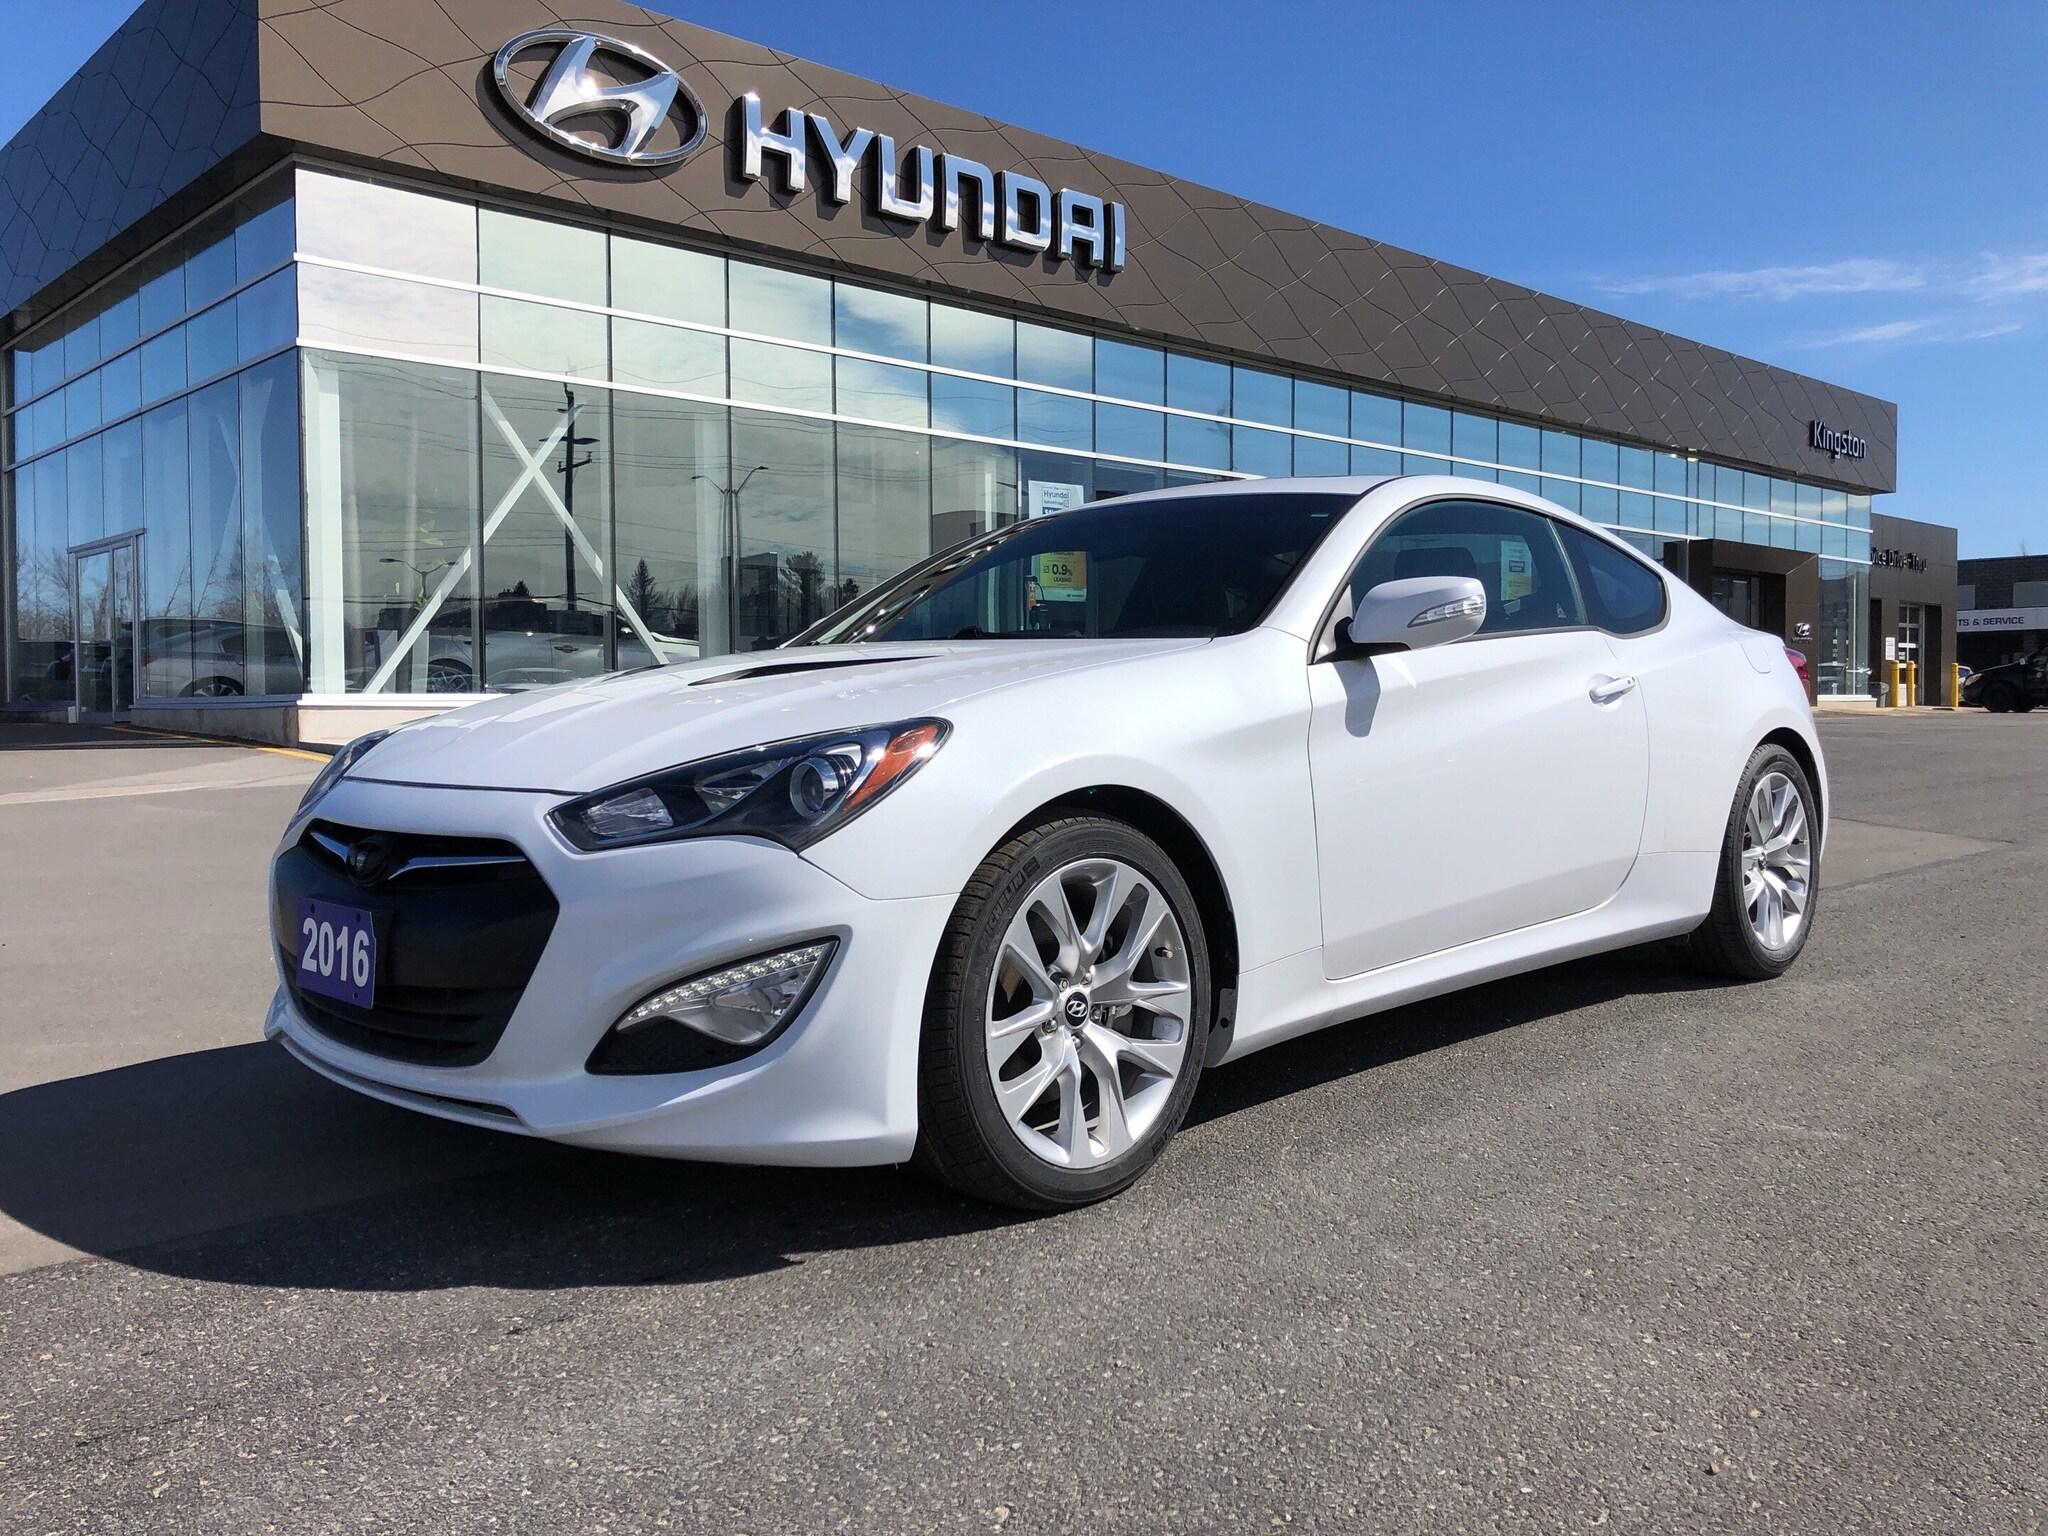 2016 Hyundai Genesis Coupe 3 8 Premium